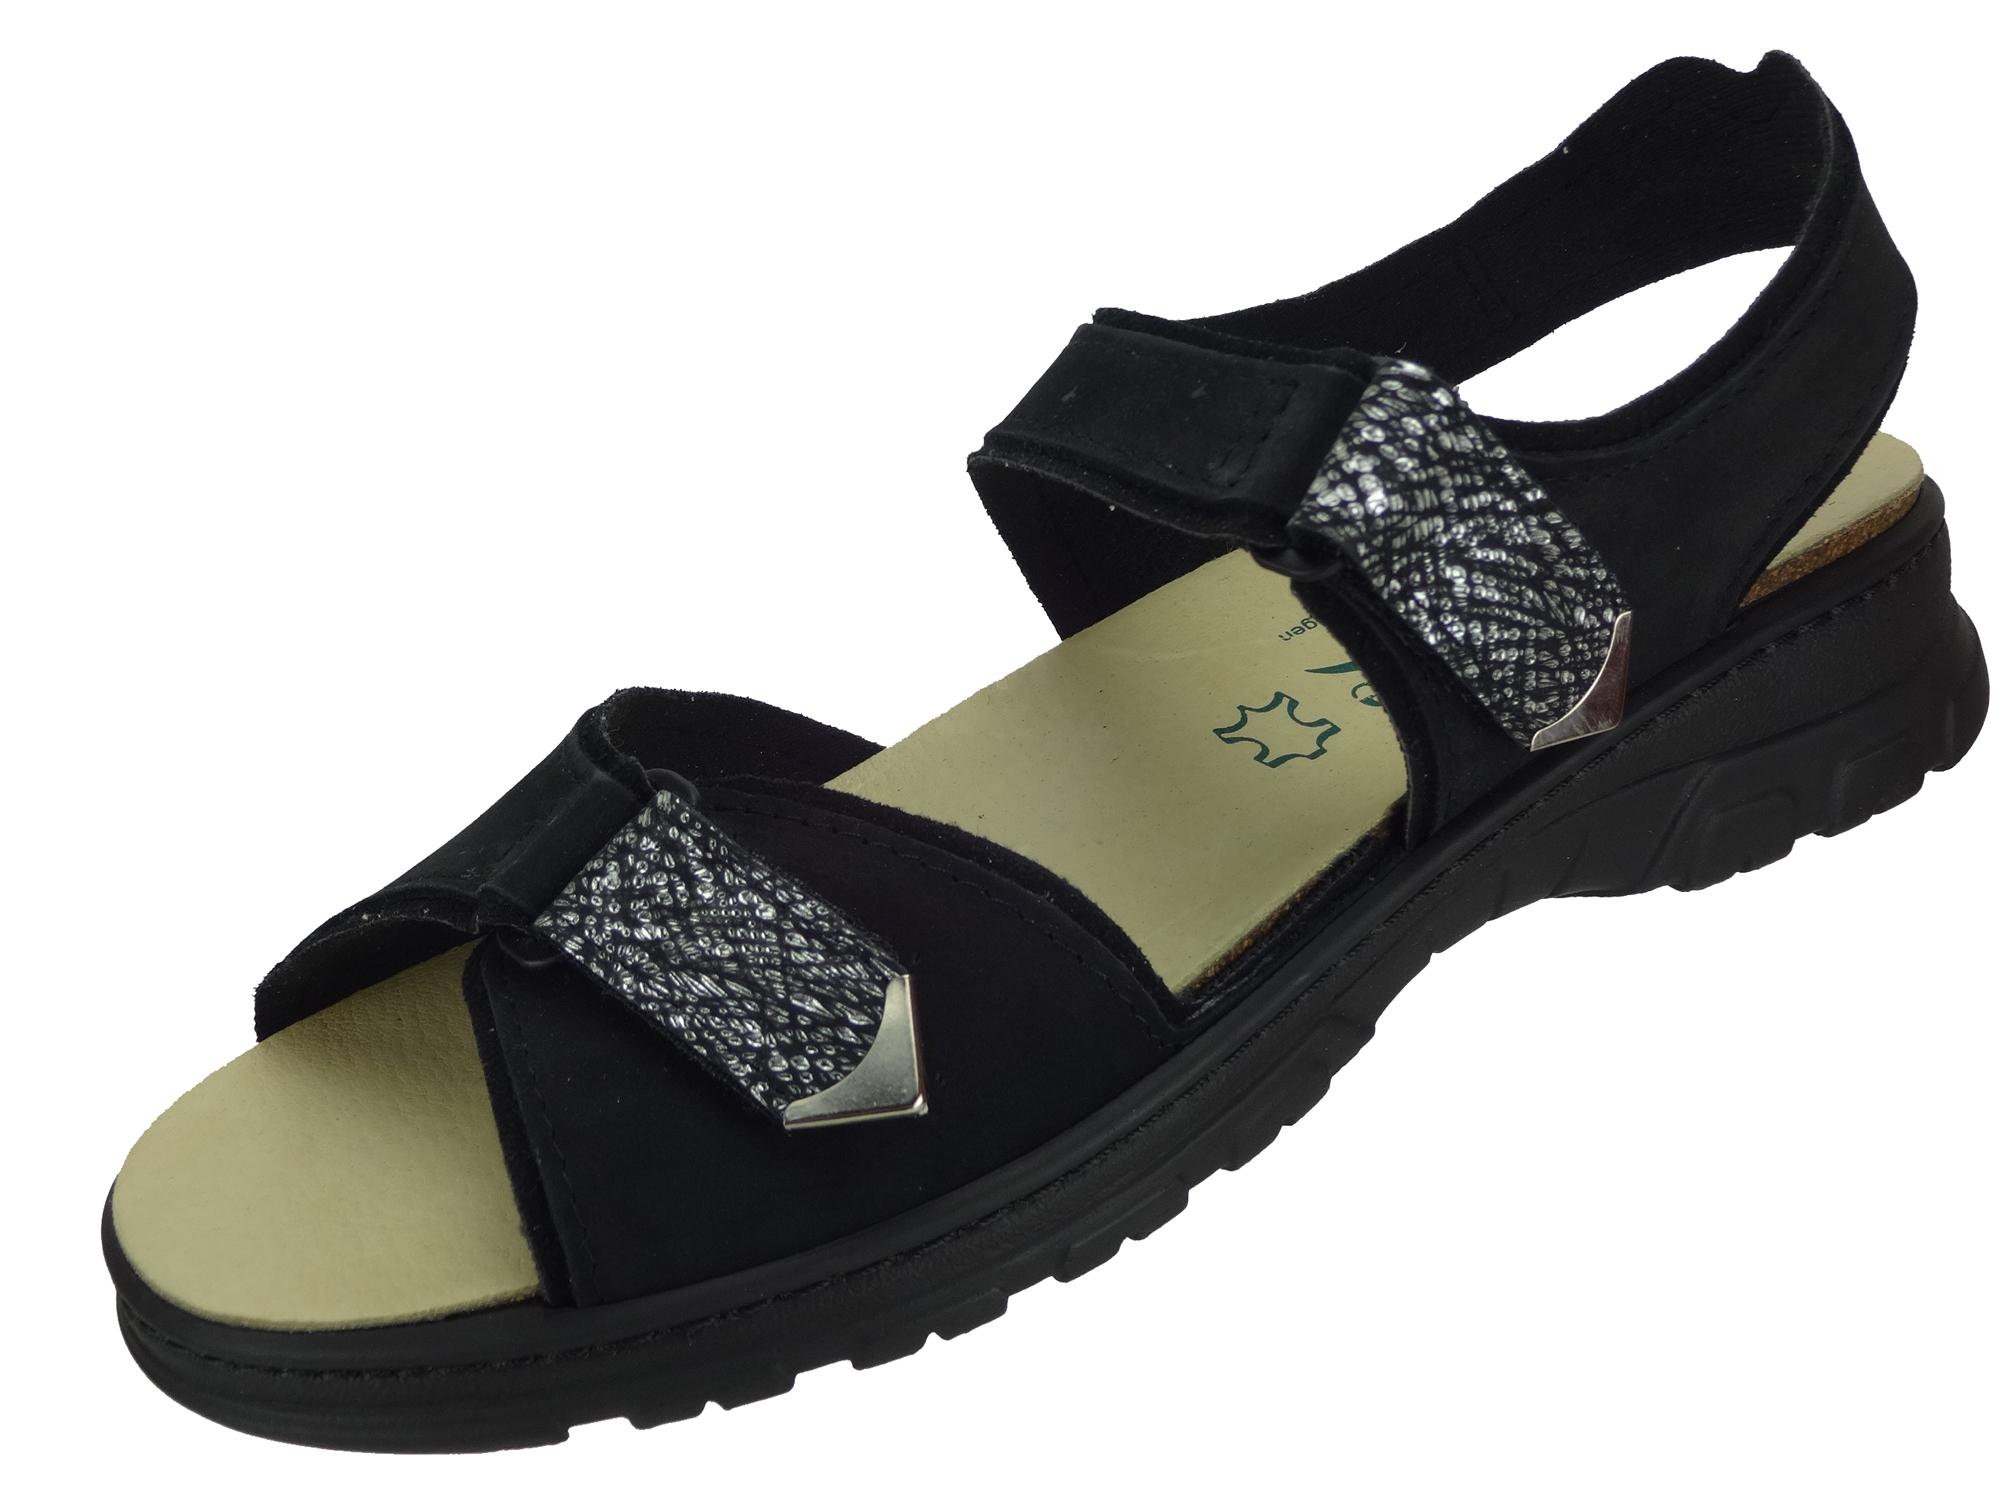 Algemare Damen Trekking Sandale Nubuk Leder waschbares Algen-Kork Fußbett 6478_0805 Sandalette Pantolette mit Wechselfußbett